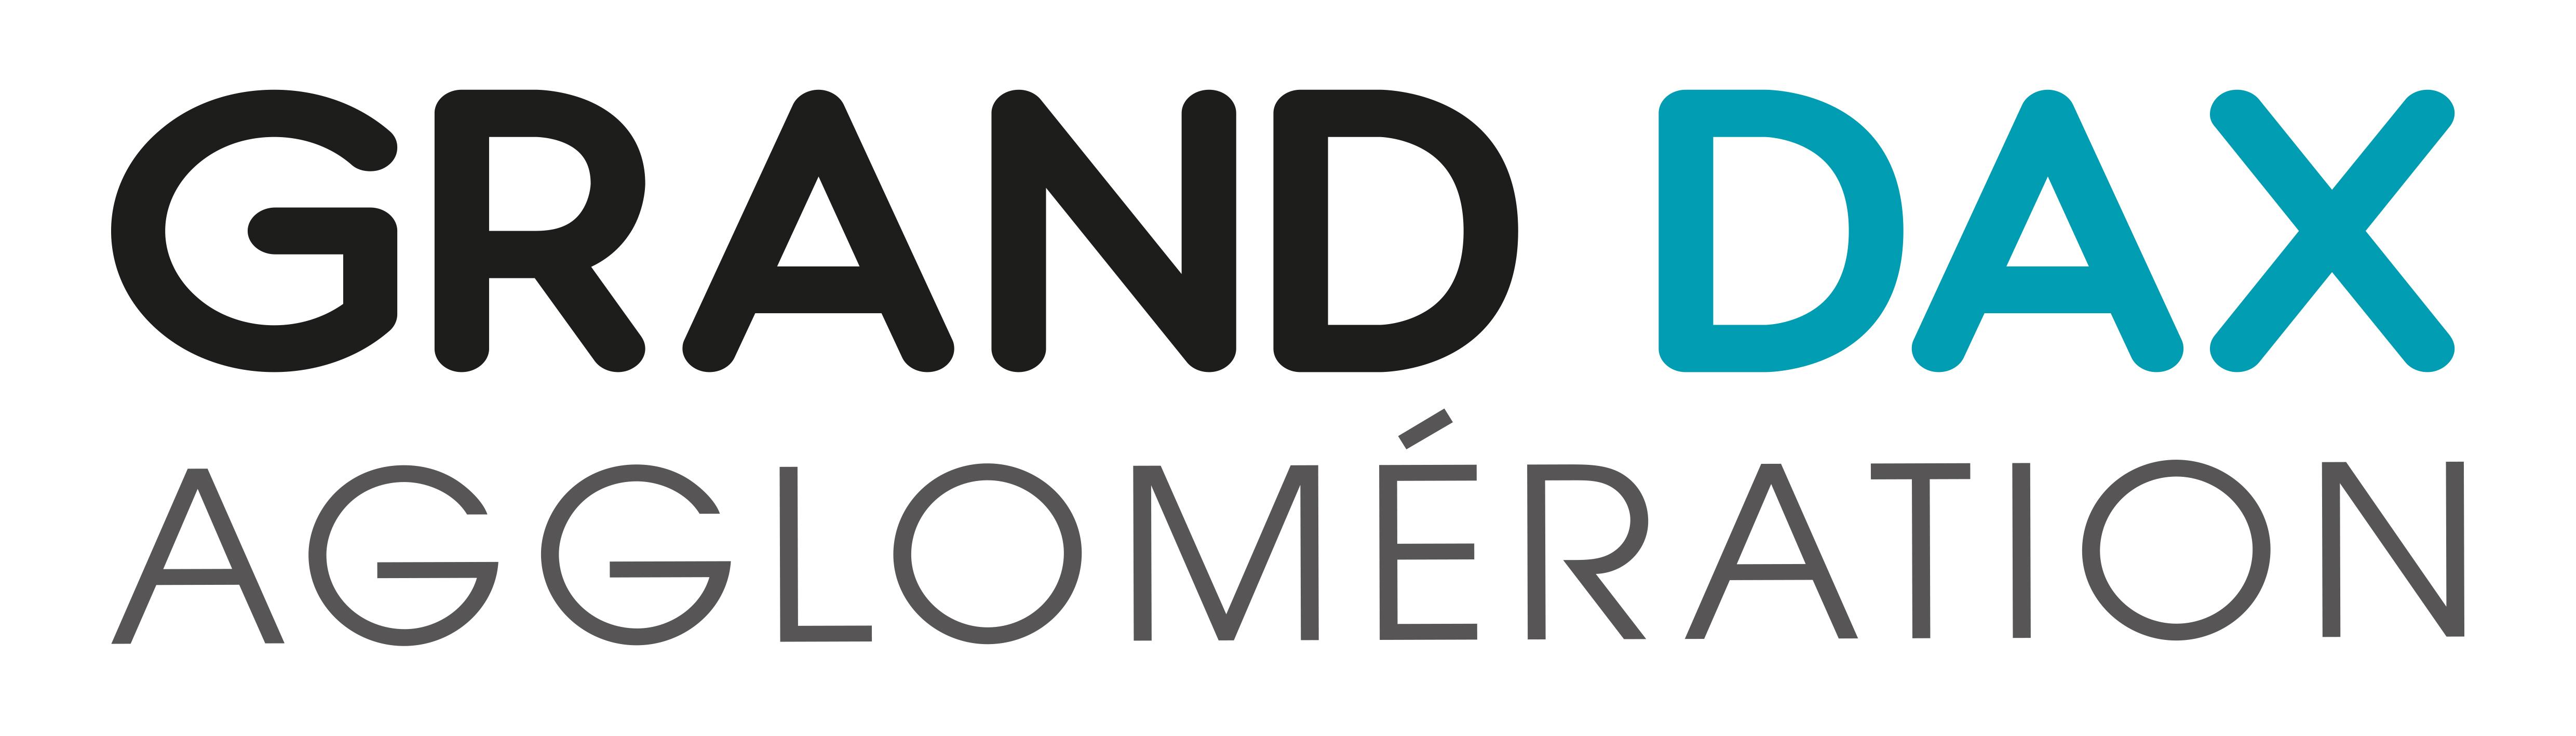 Grand Dax logo.jpg